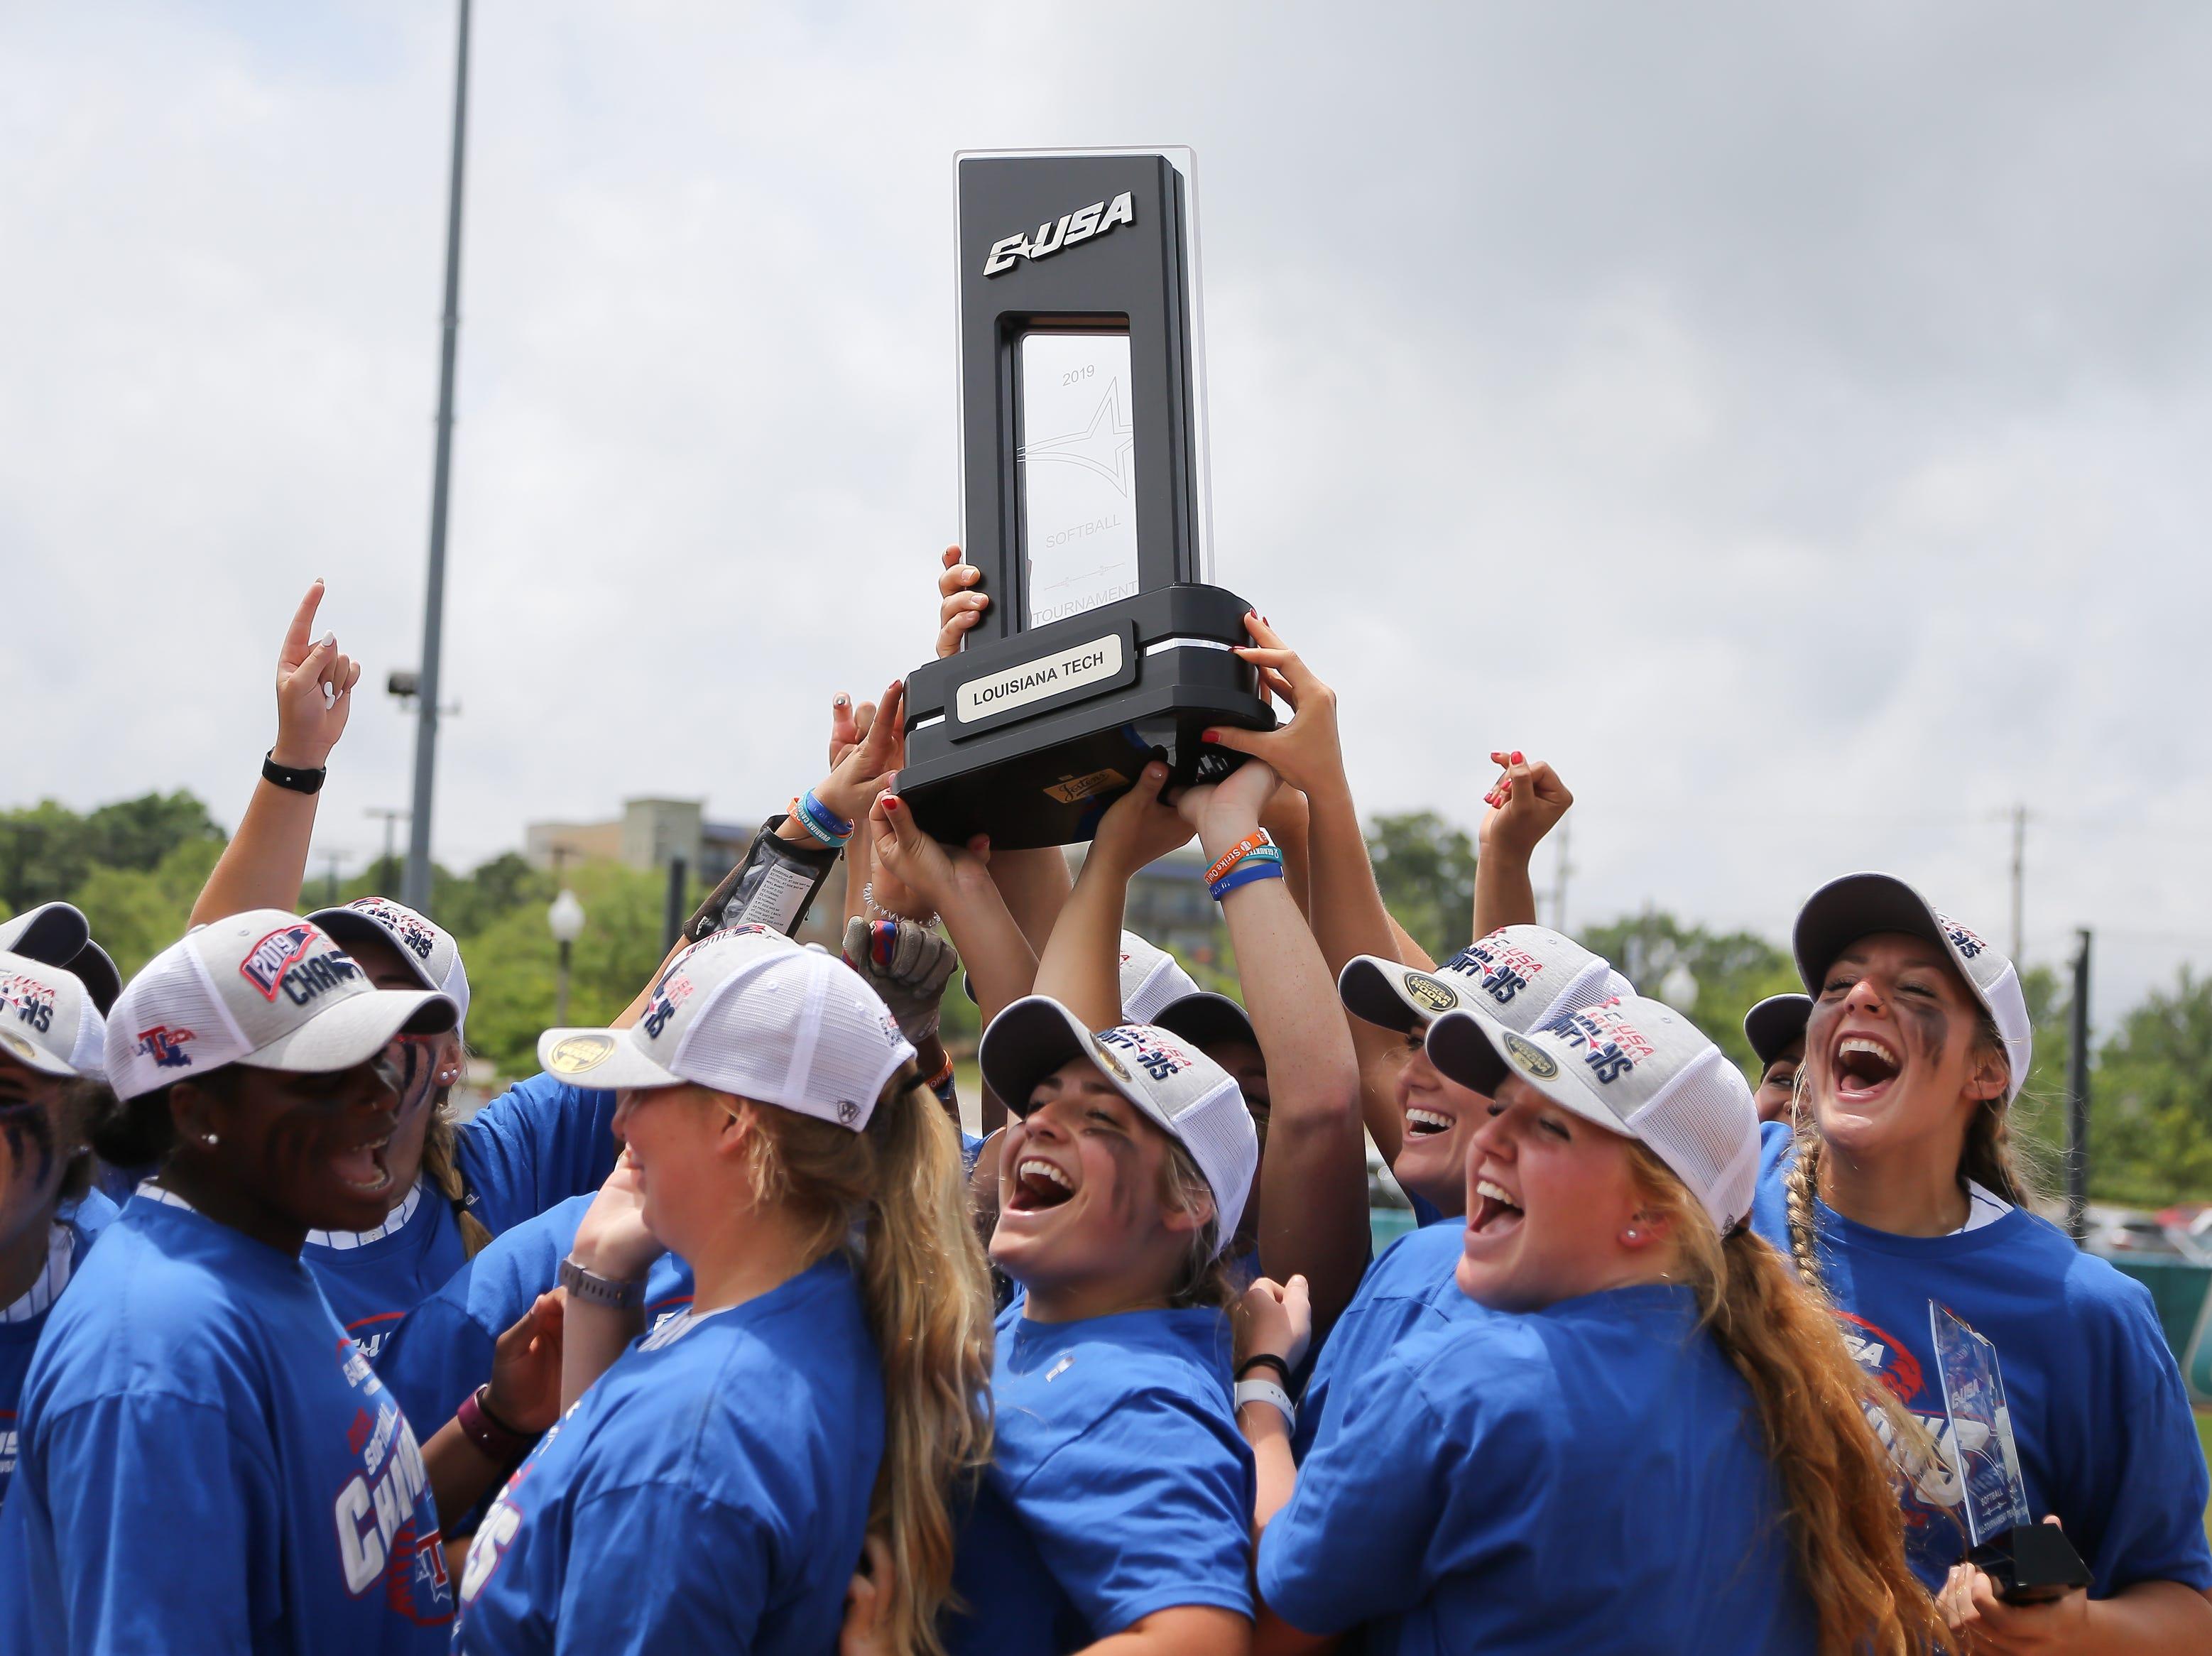 Louisiana Tech heads to LSU for NCAA regionals